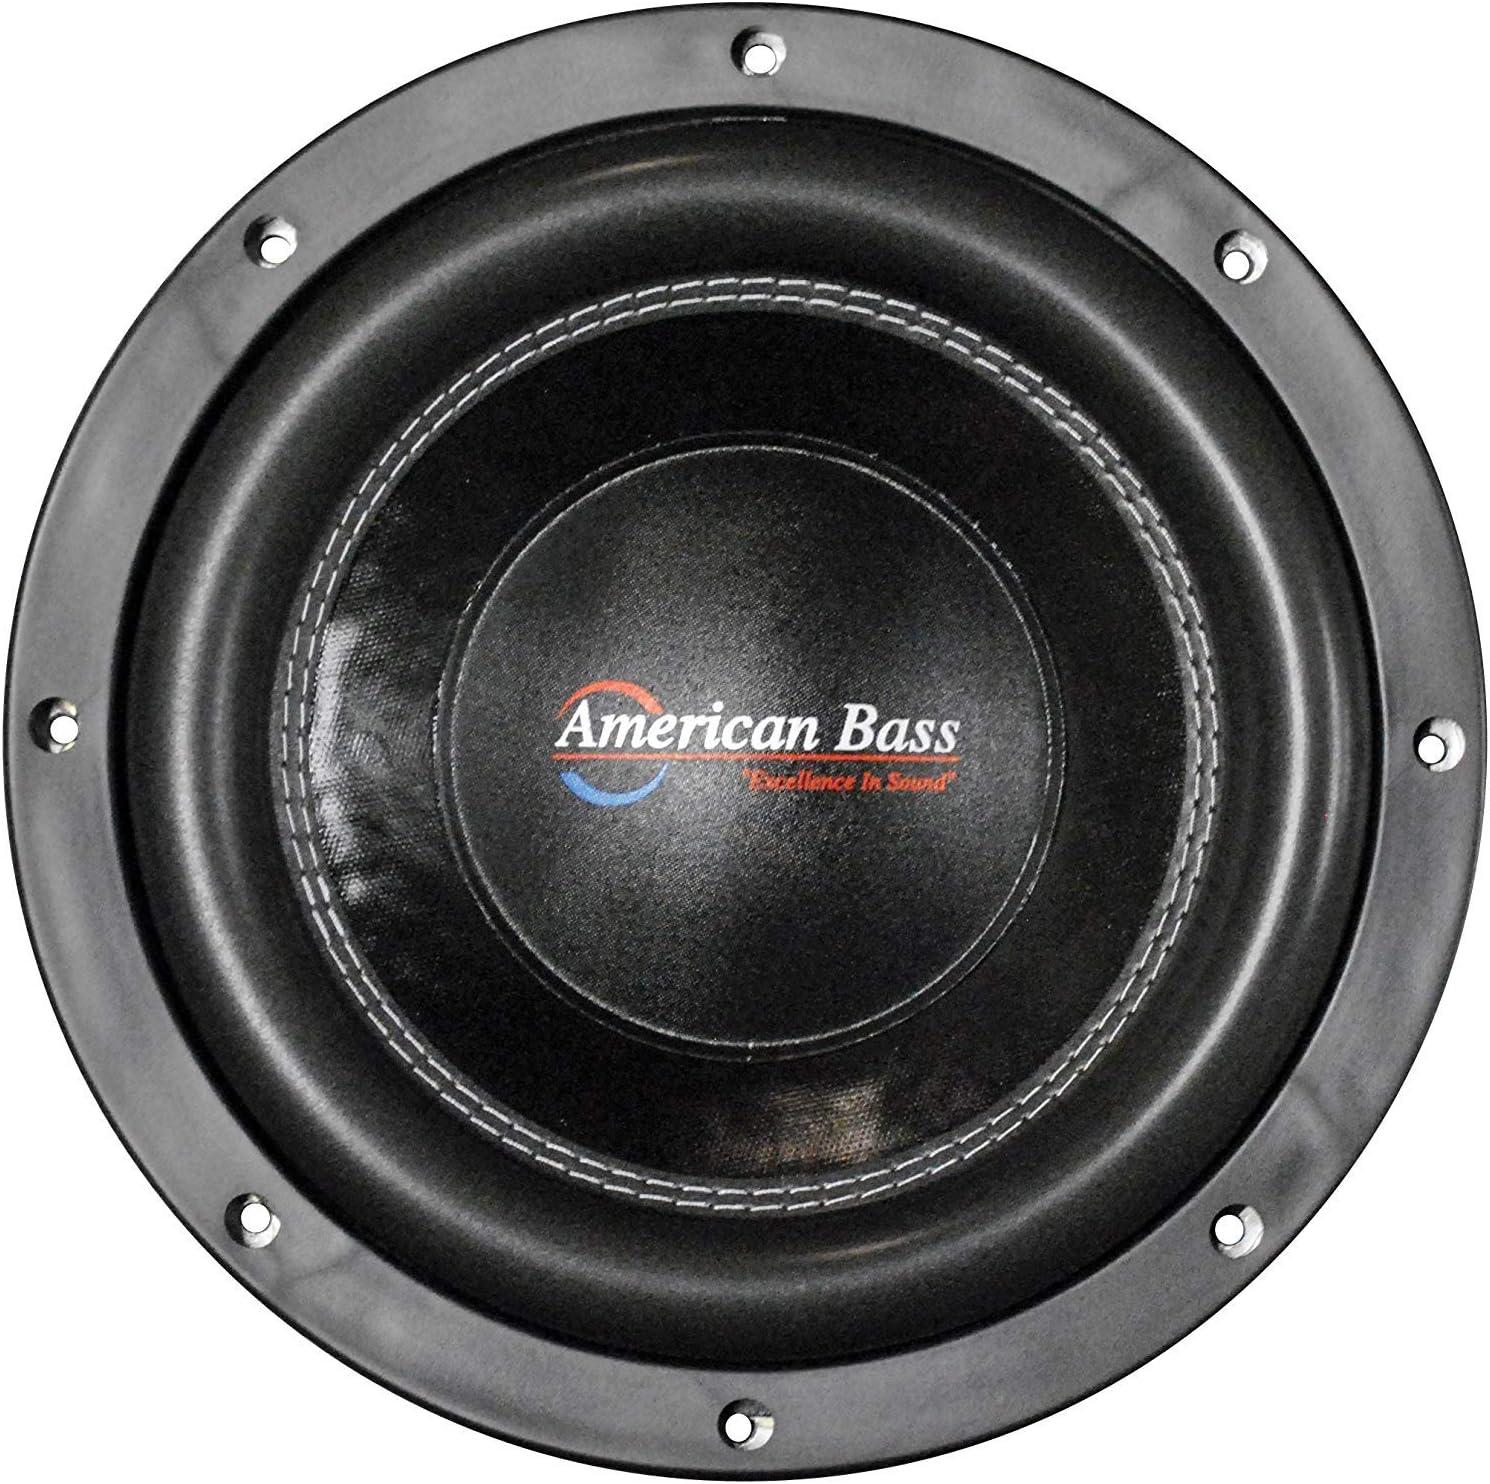 (-NEW-) American Bass XFL1044 10 inch 2000 Watts Subwoofer 81rzgSoMAaLSL1500_